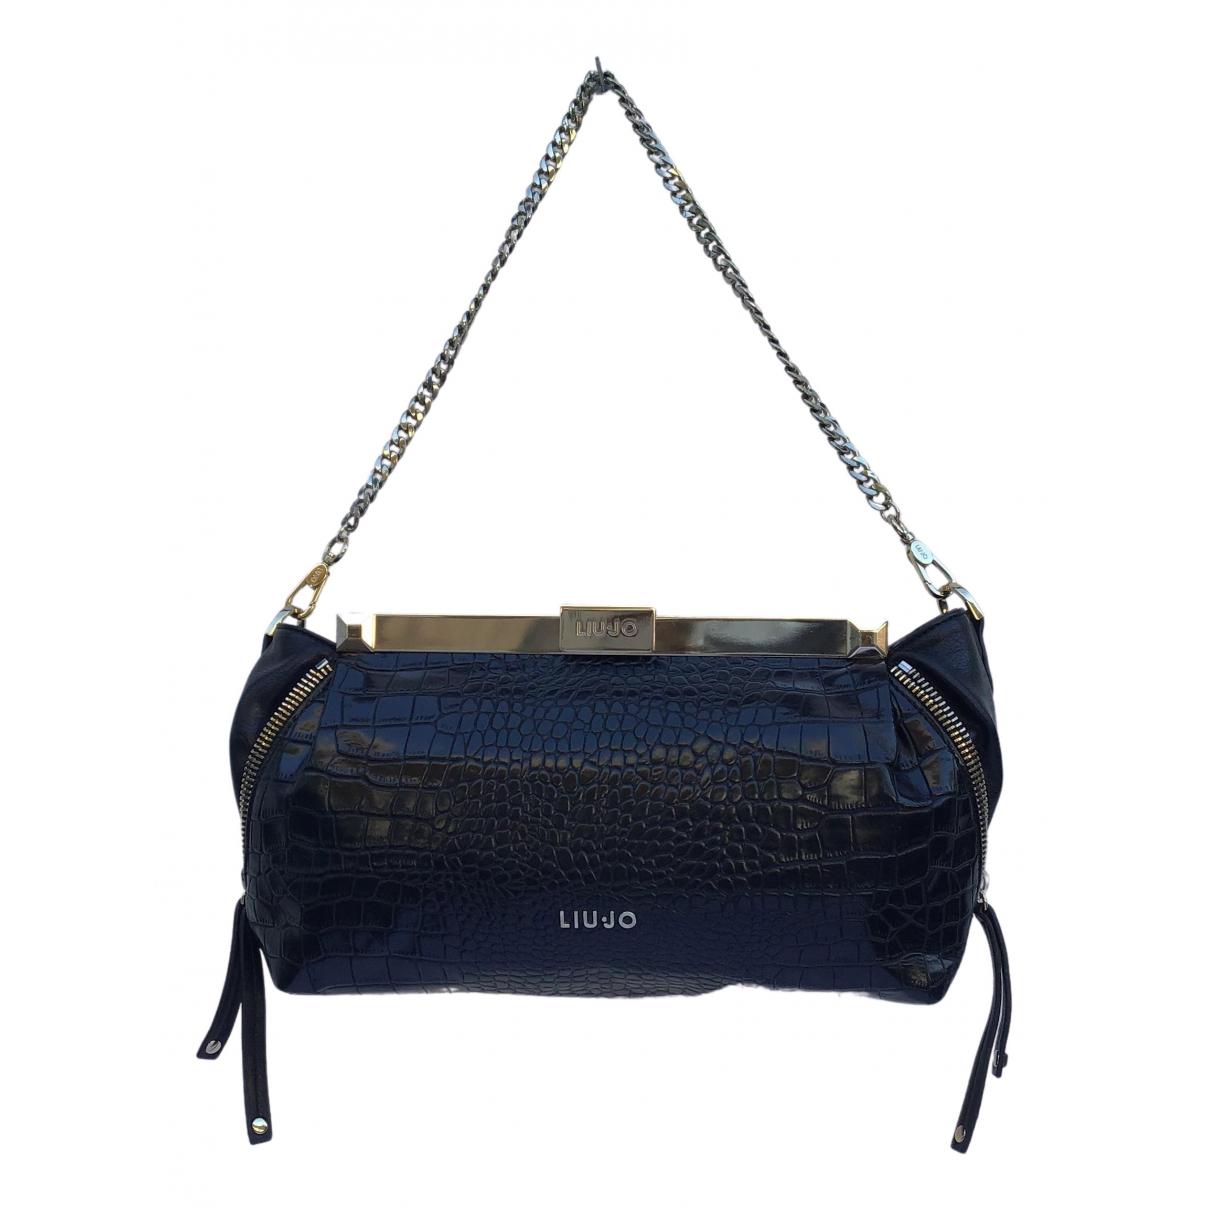 Liu.jo N Black handbag for Women N